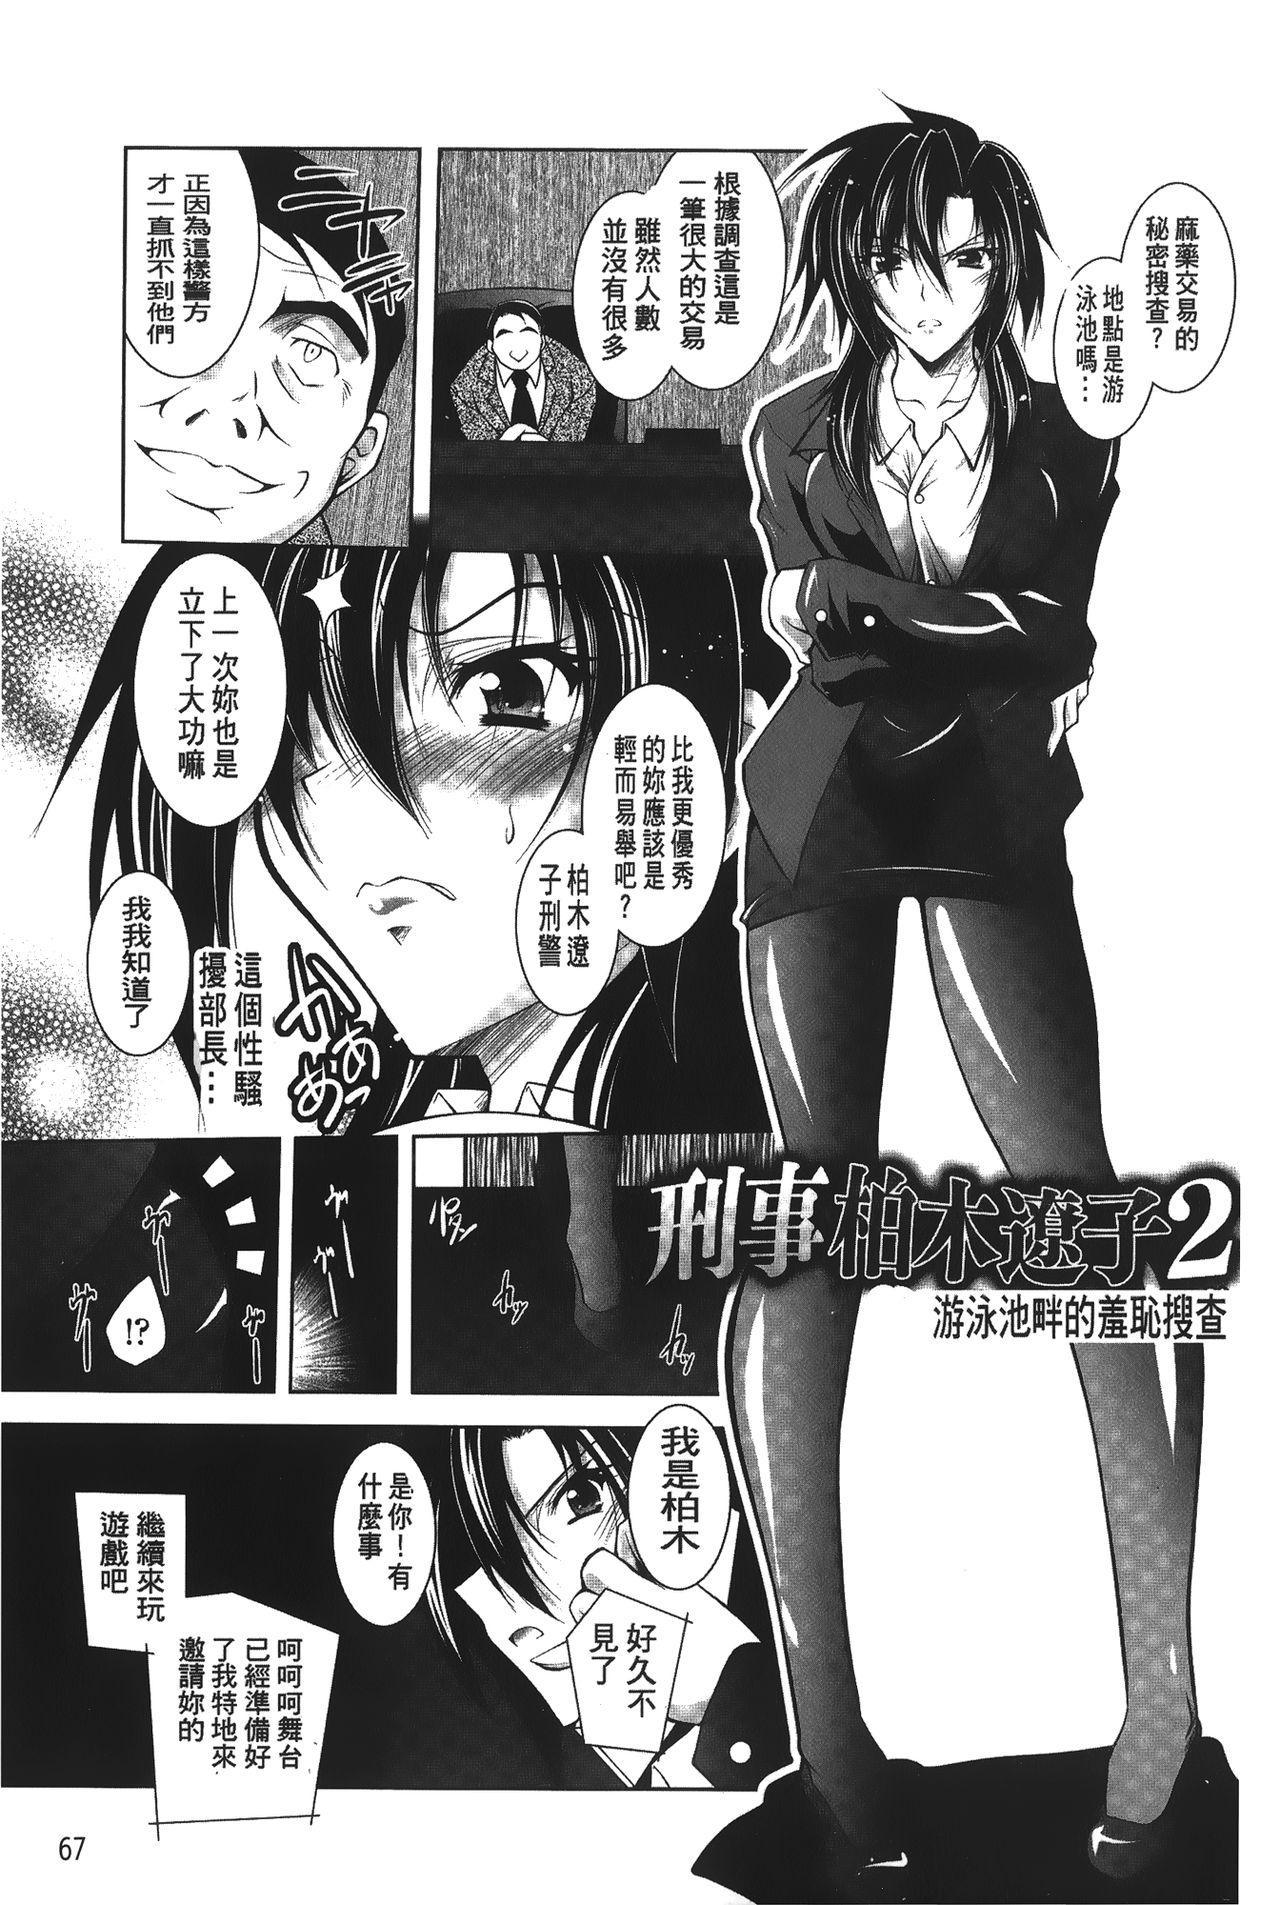 [Parfait] Datenshi-tachi no Rondo - Fallen Angels Rondo   墮天使們的圓舞曲 [Chinese] 67